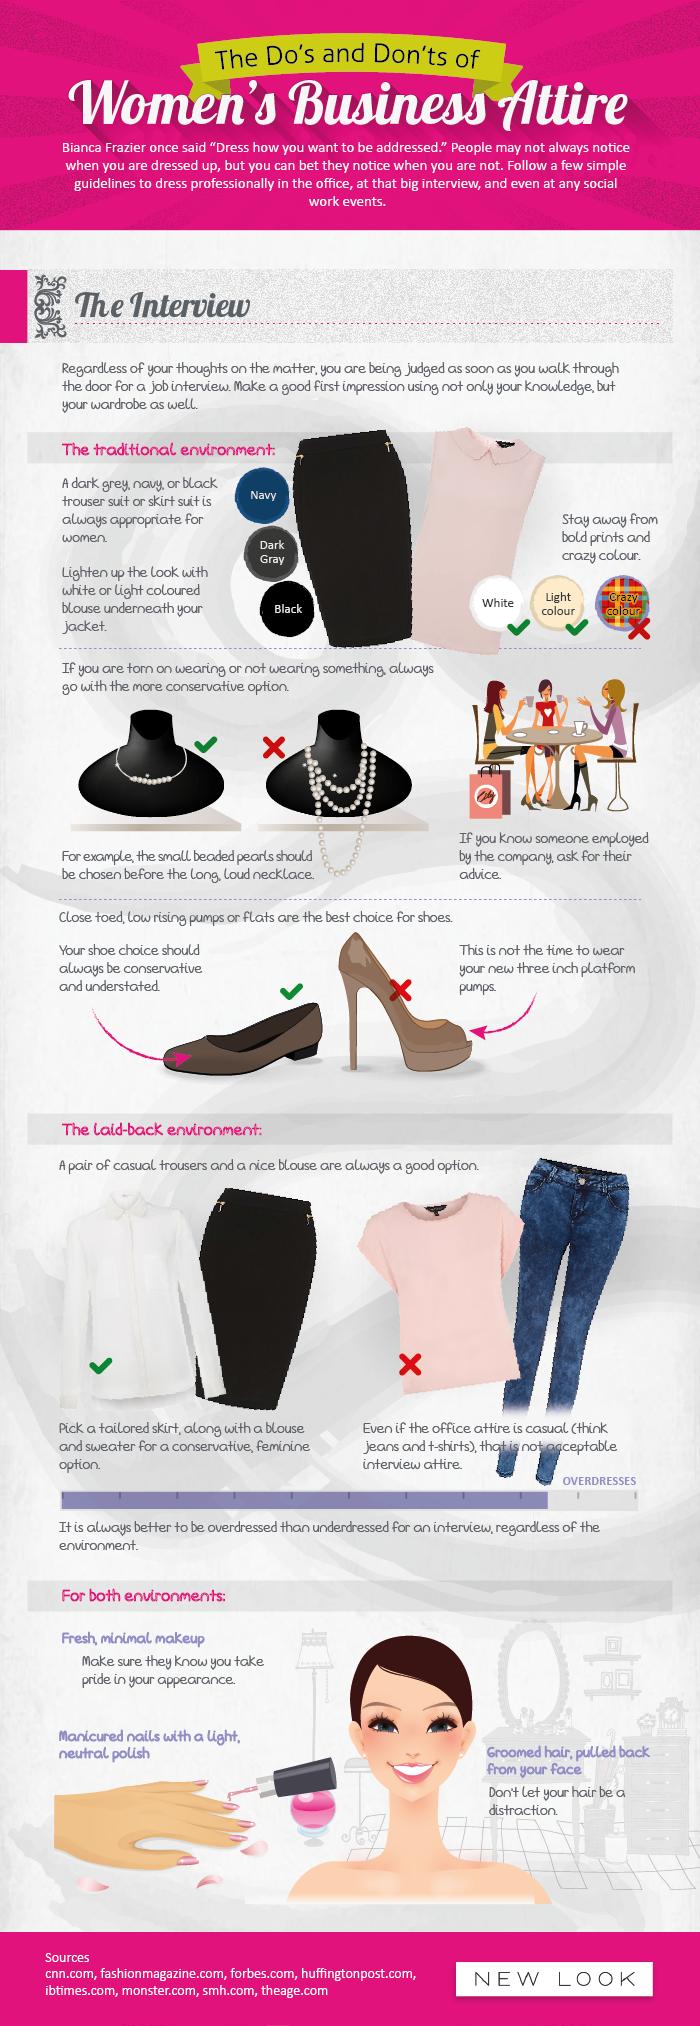 WomenO^C¸O¨s Guide to Business Attire-splitted-03